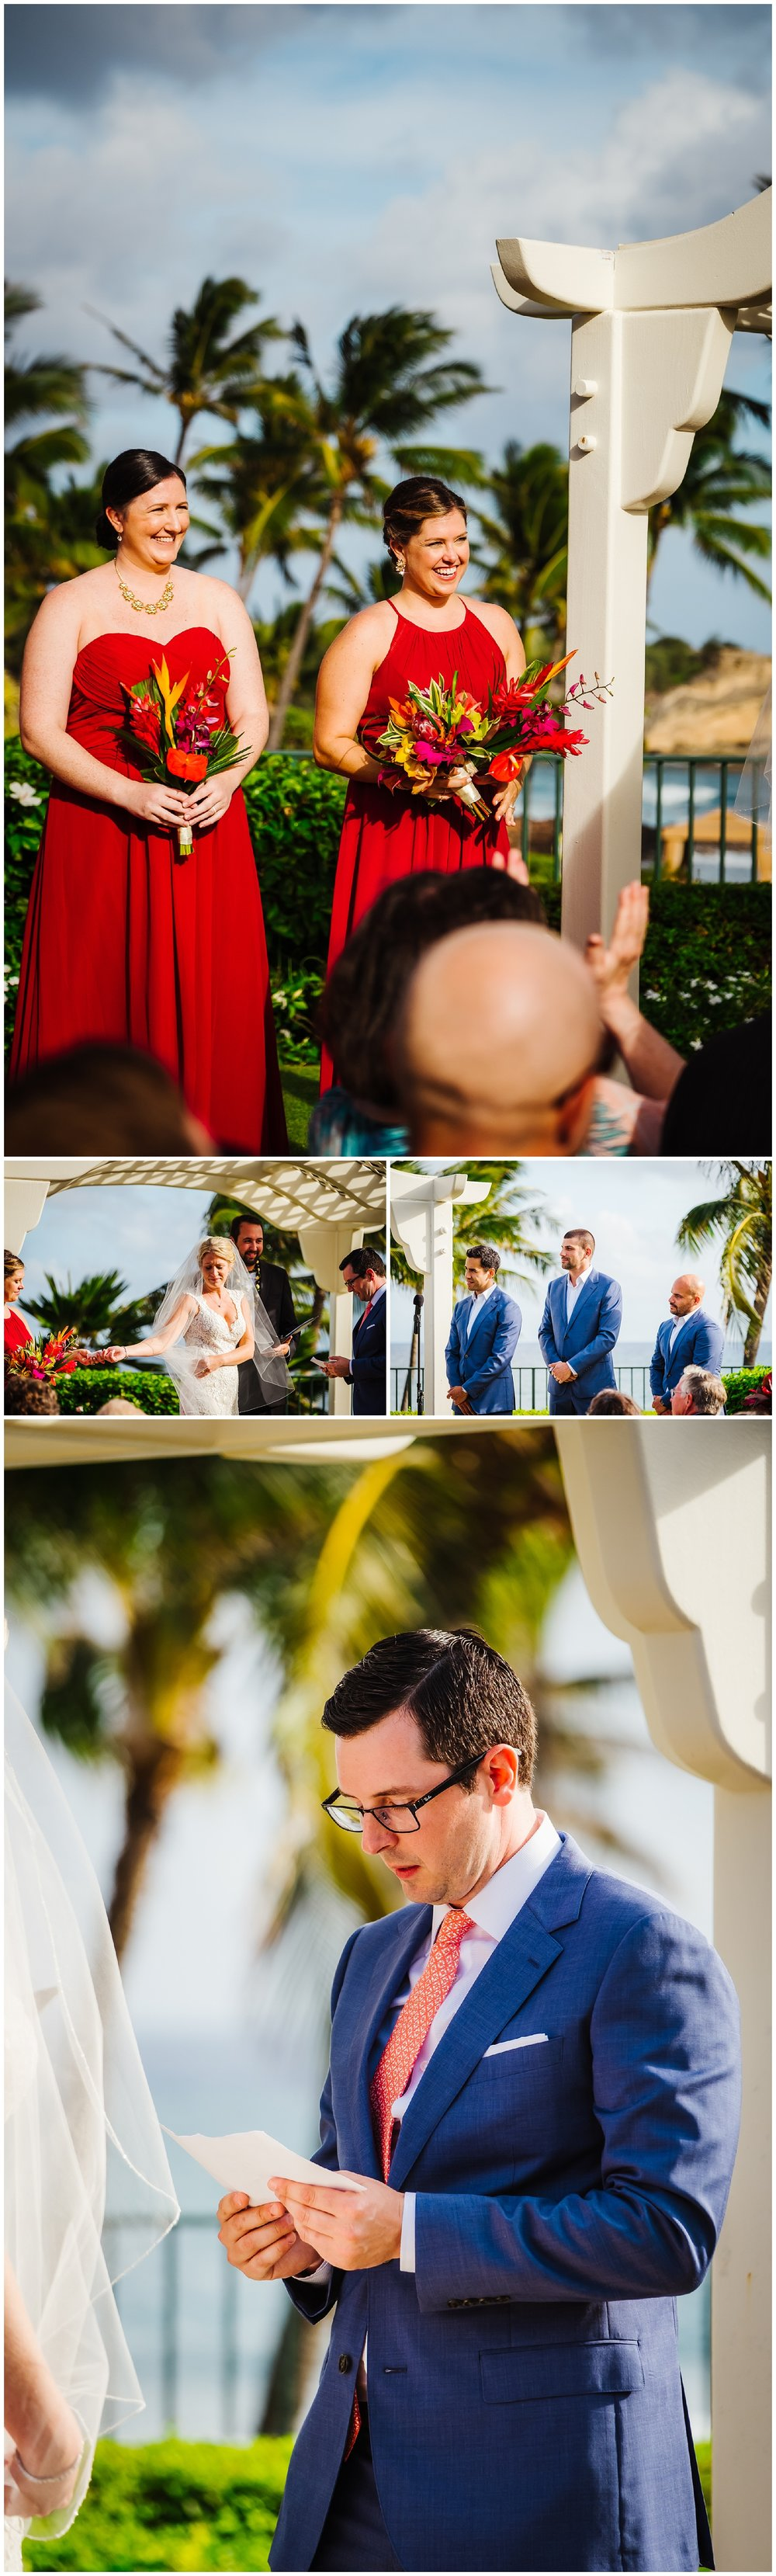 destination-wedding-hawaii-kauai-grand-hyatt-resort-napali-coast-sail_0070.jpg